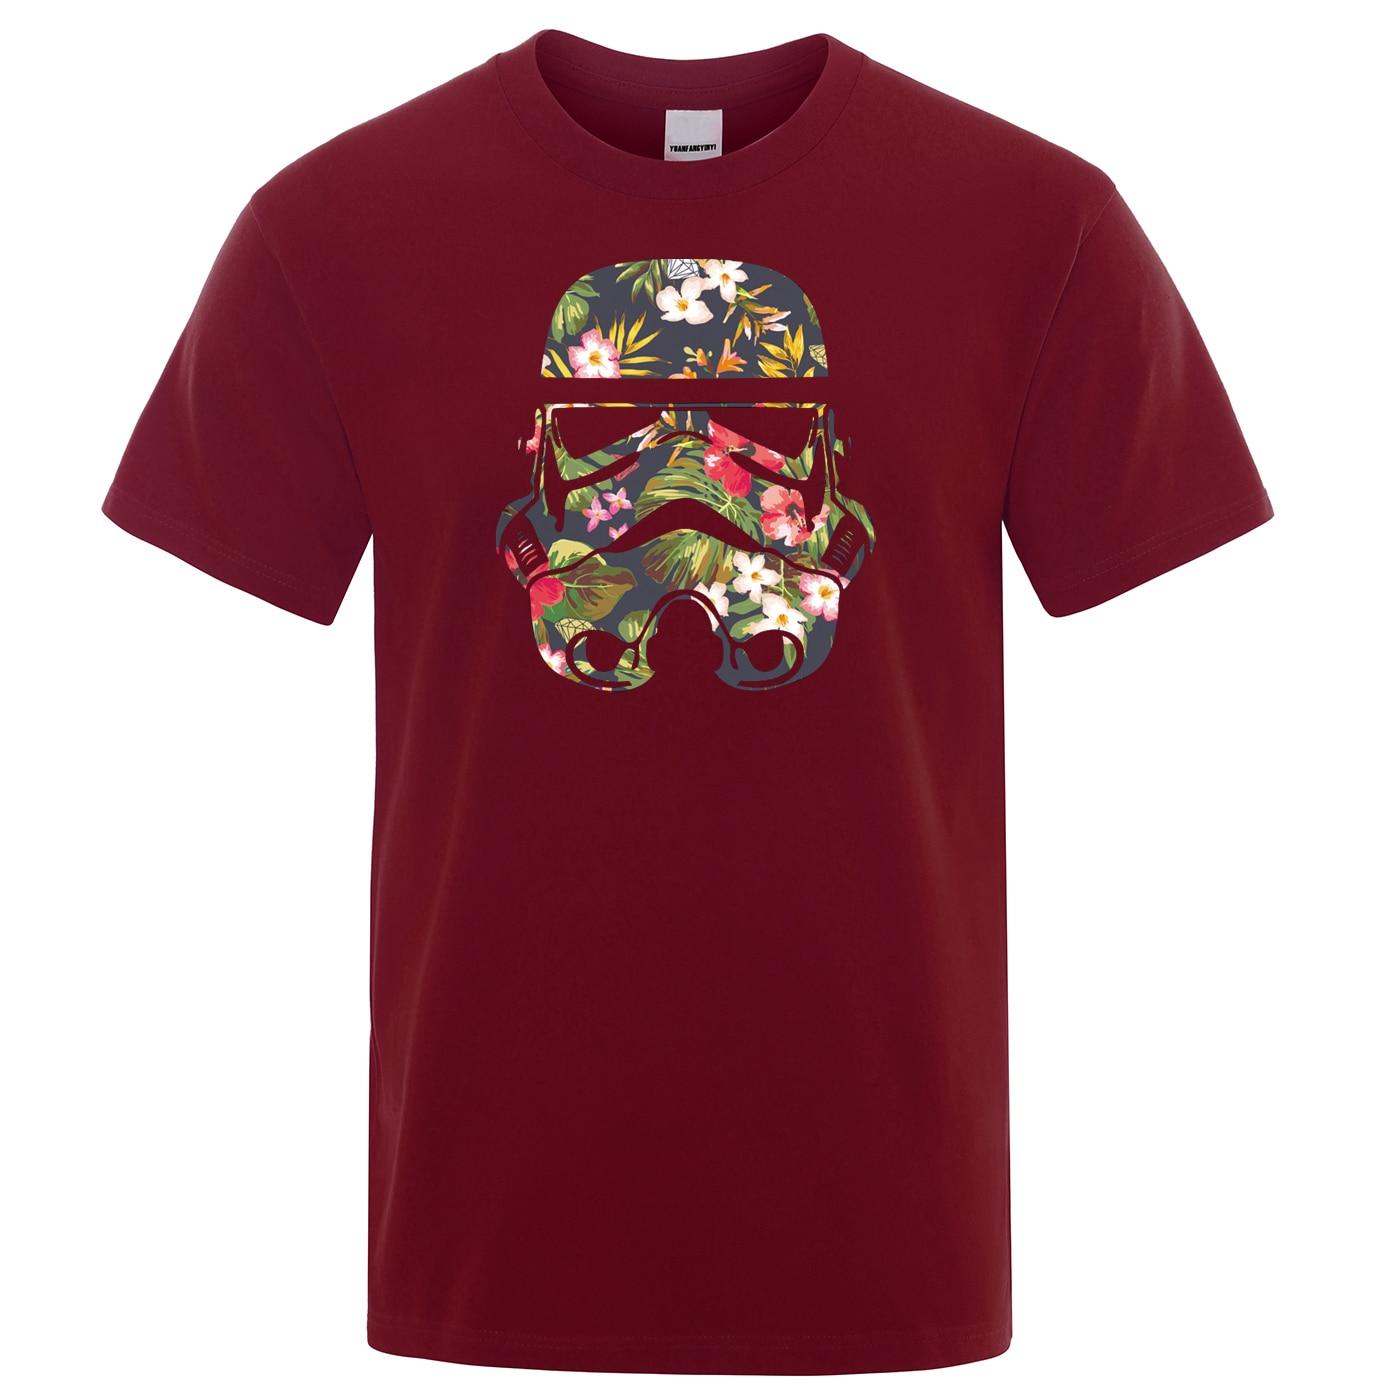 Star Wars Man T-Shirts Casual Streetwear Men's T Shirts Funny Hip Hop Male TShirt 2019 Summer High Quality Tops Men Tee Shirt